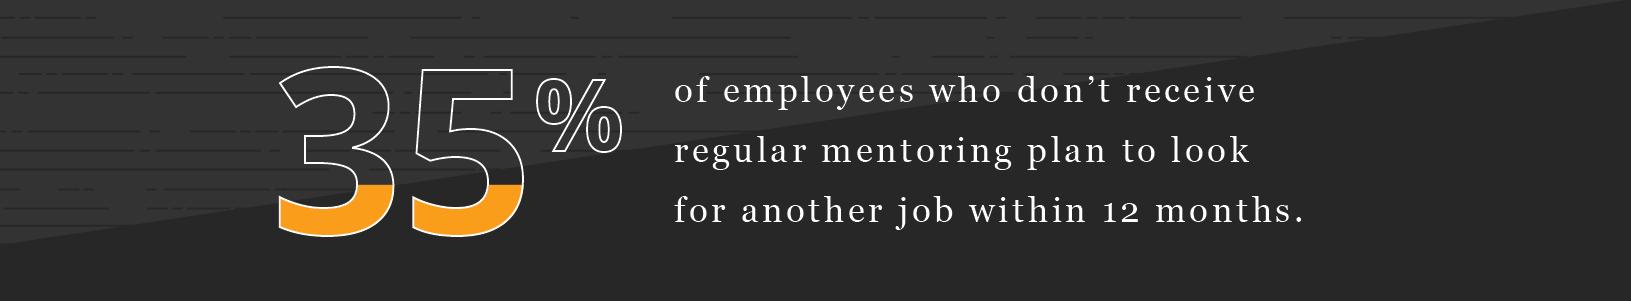 corporate mentoring statistics